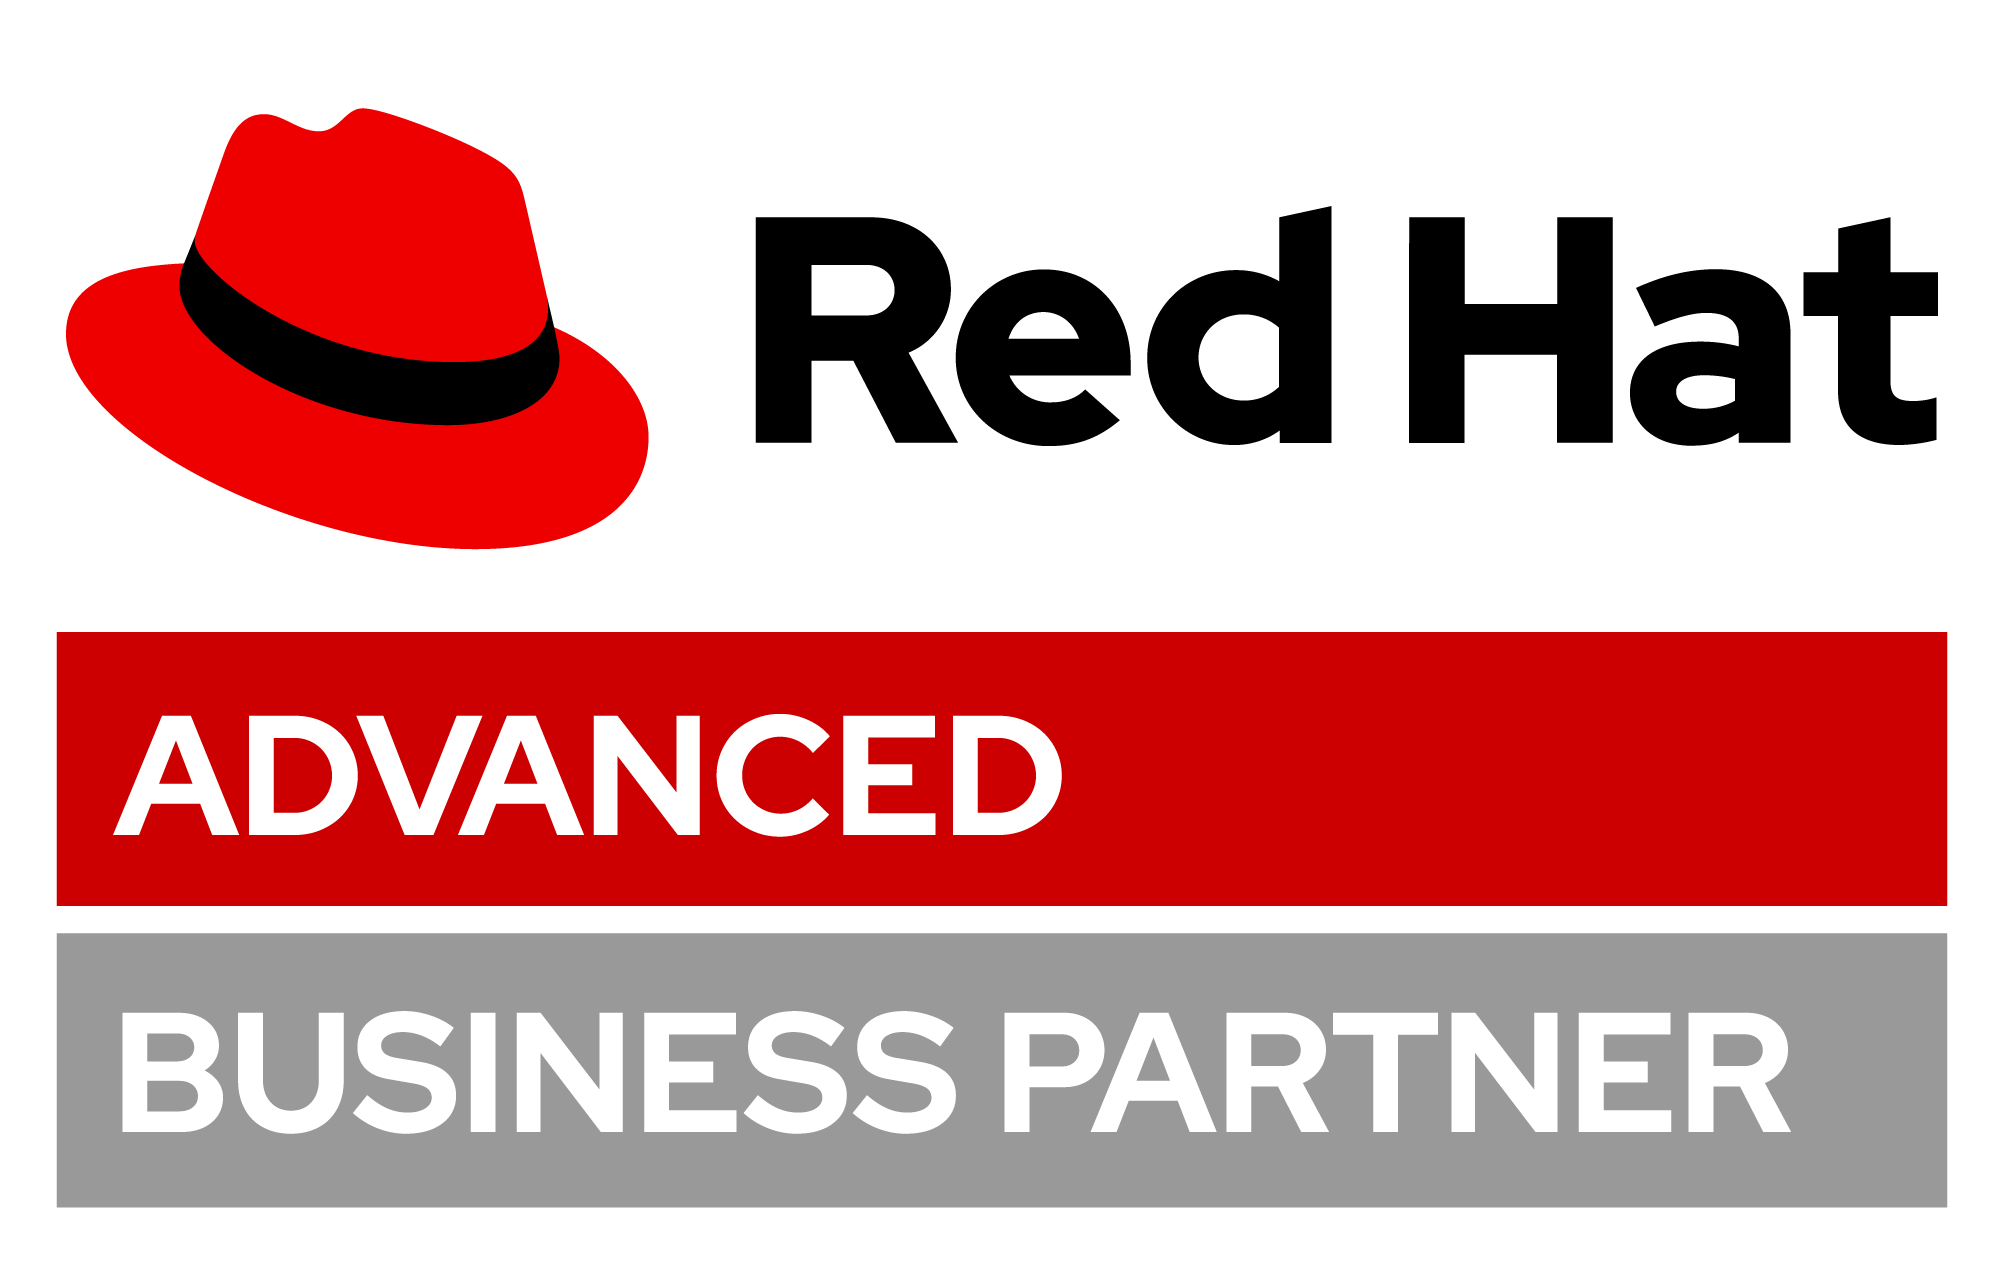 red-hat-new-logo-advanced-business-partner